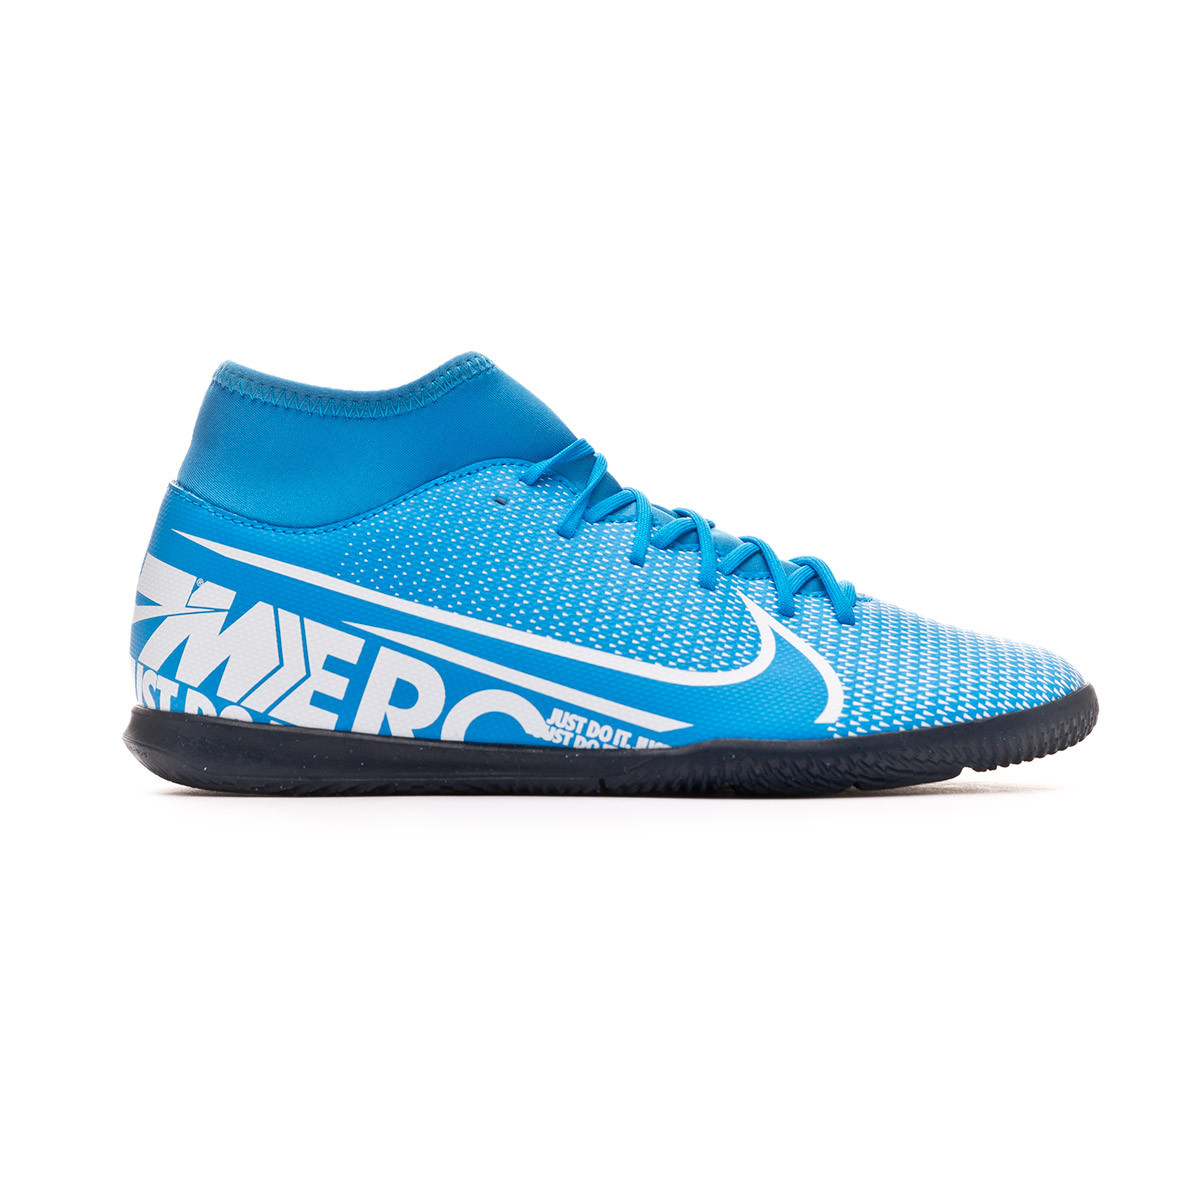 Sapatilha de Futsal Nike Mercurial Superfly VII Club IC